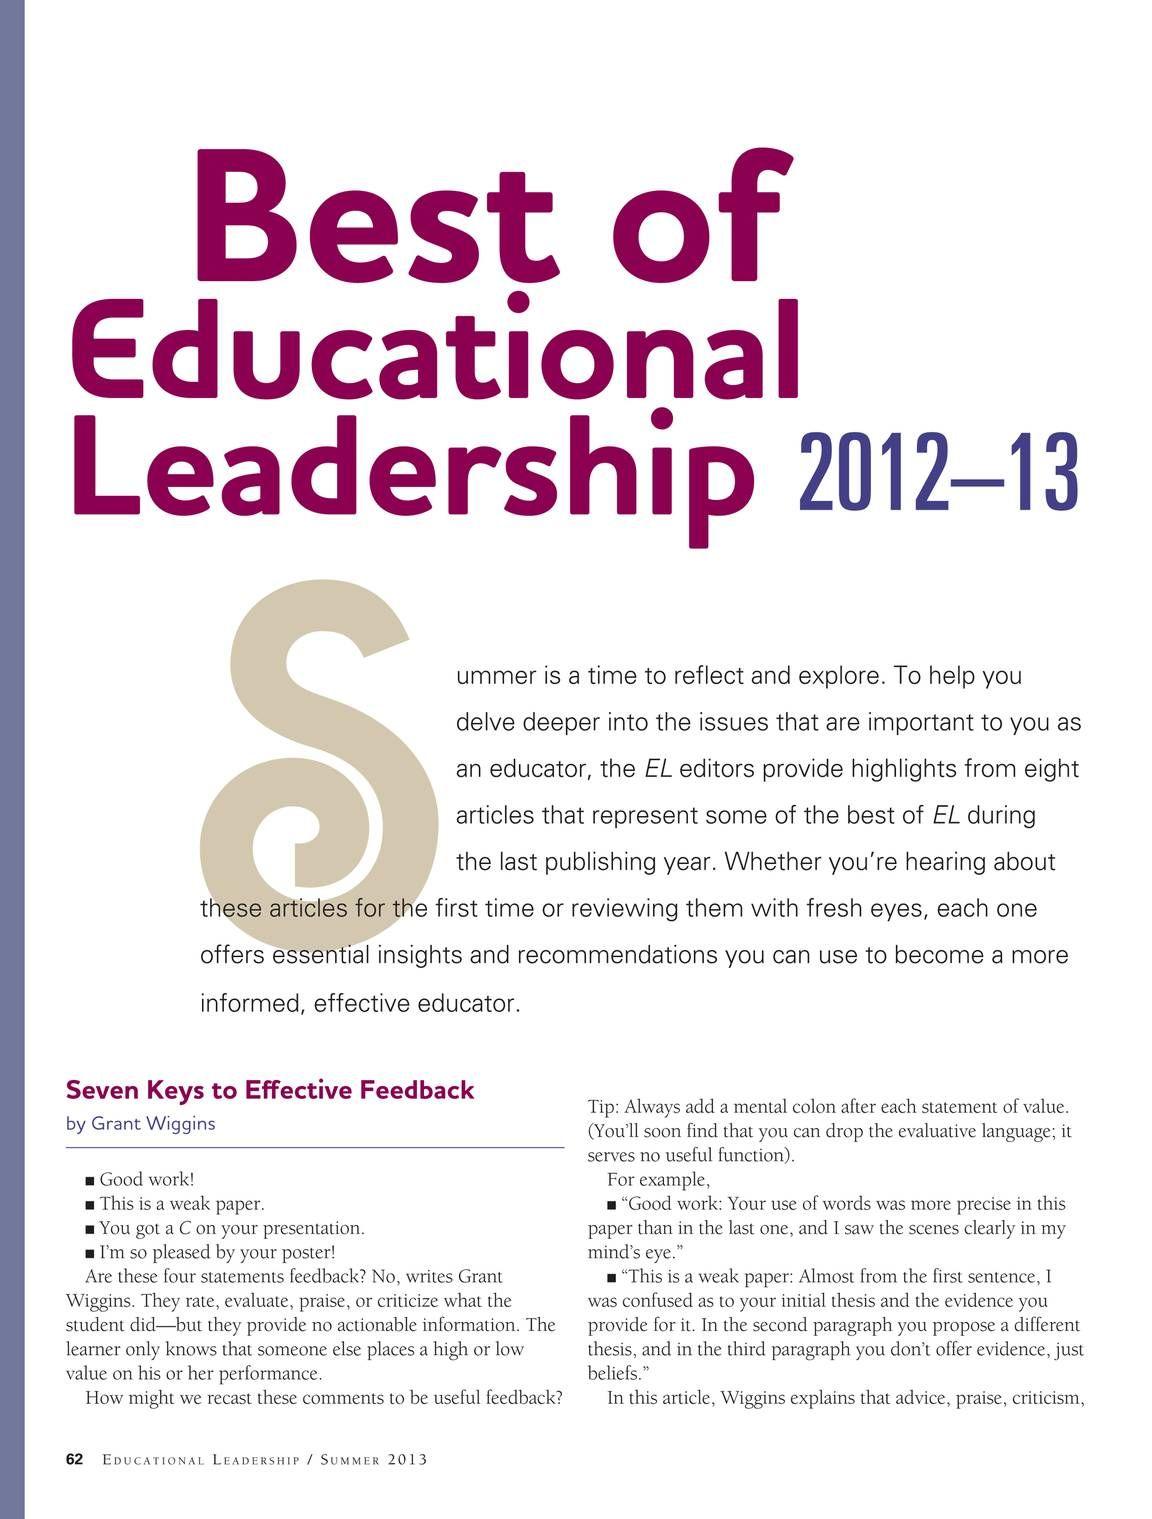 Educational Leadership Is A Magazine For Educators By Educators